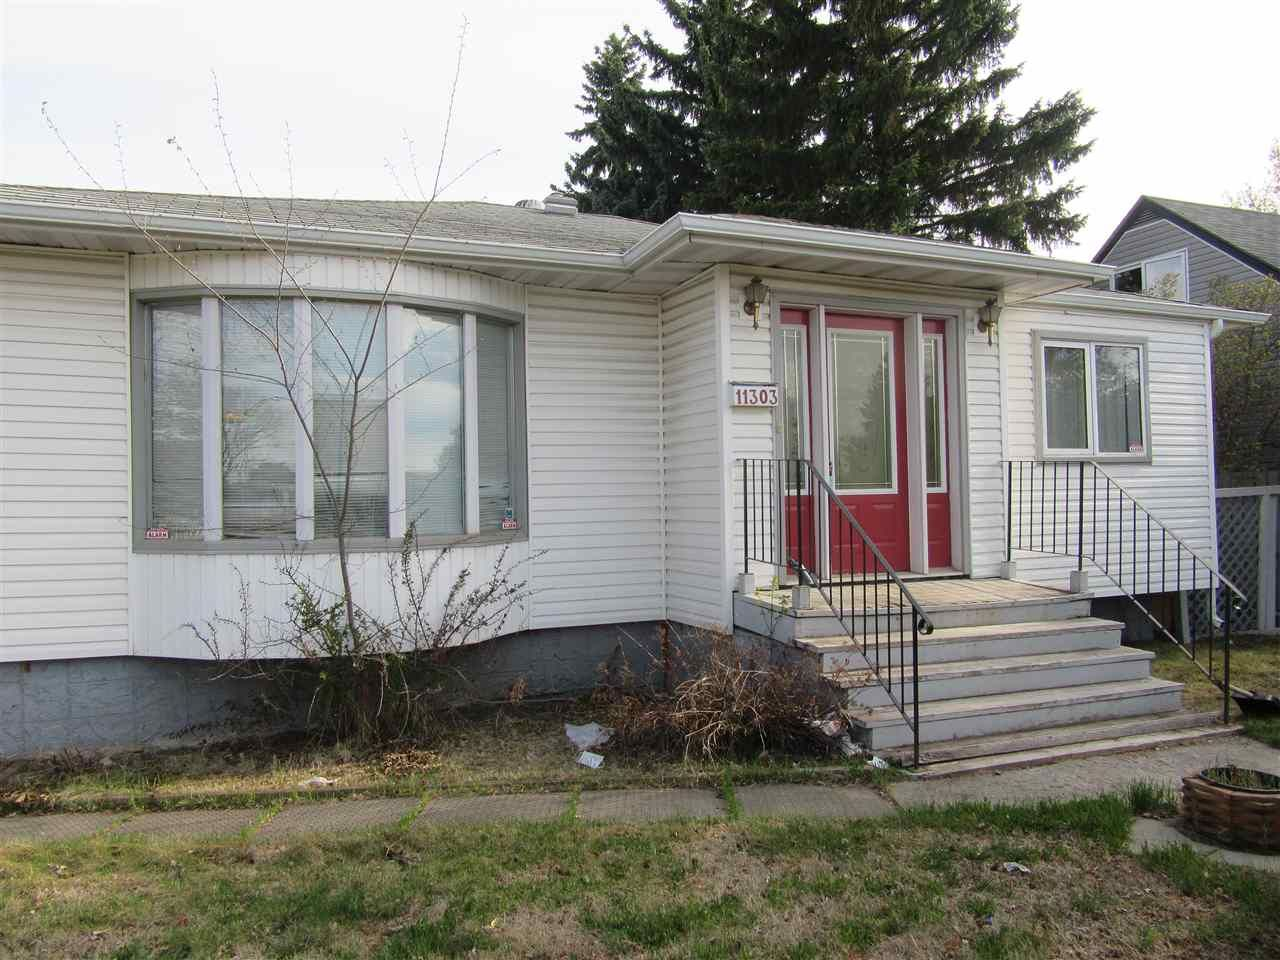 Main Photo: 11303 111 Avenue in Edmonton: Zone 08 House for sale : MLS®# E4243892